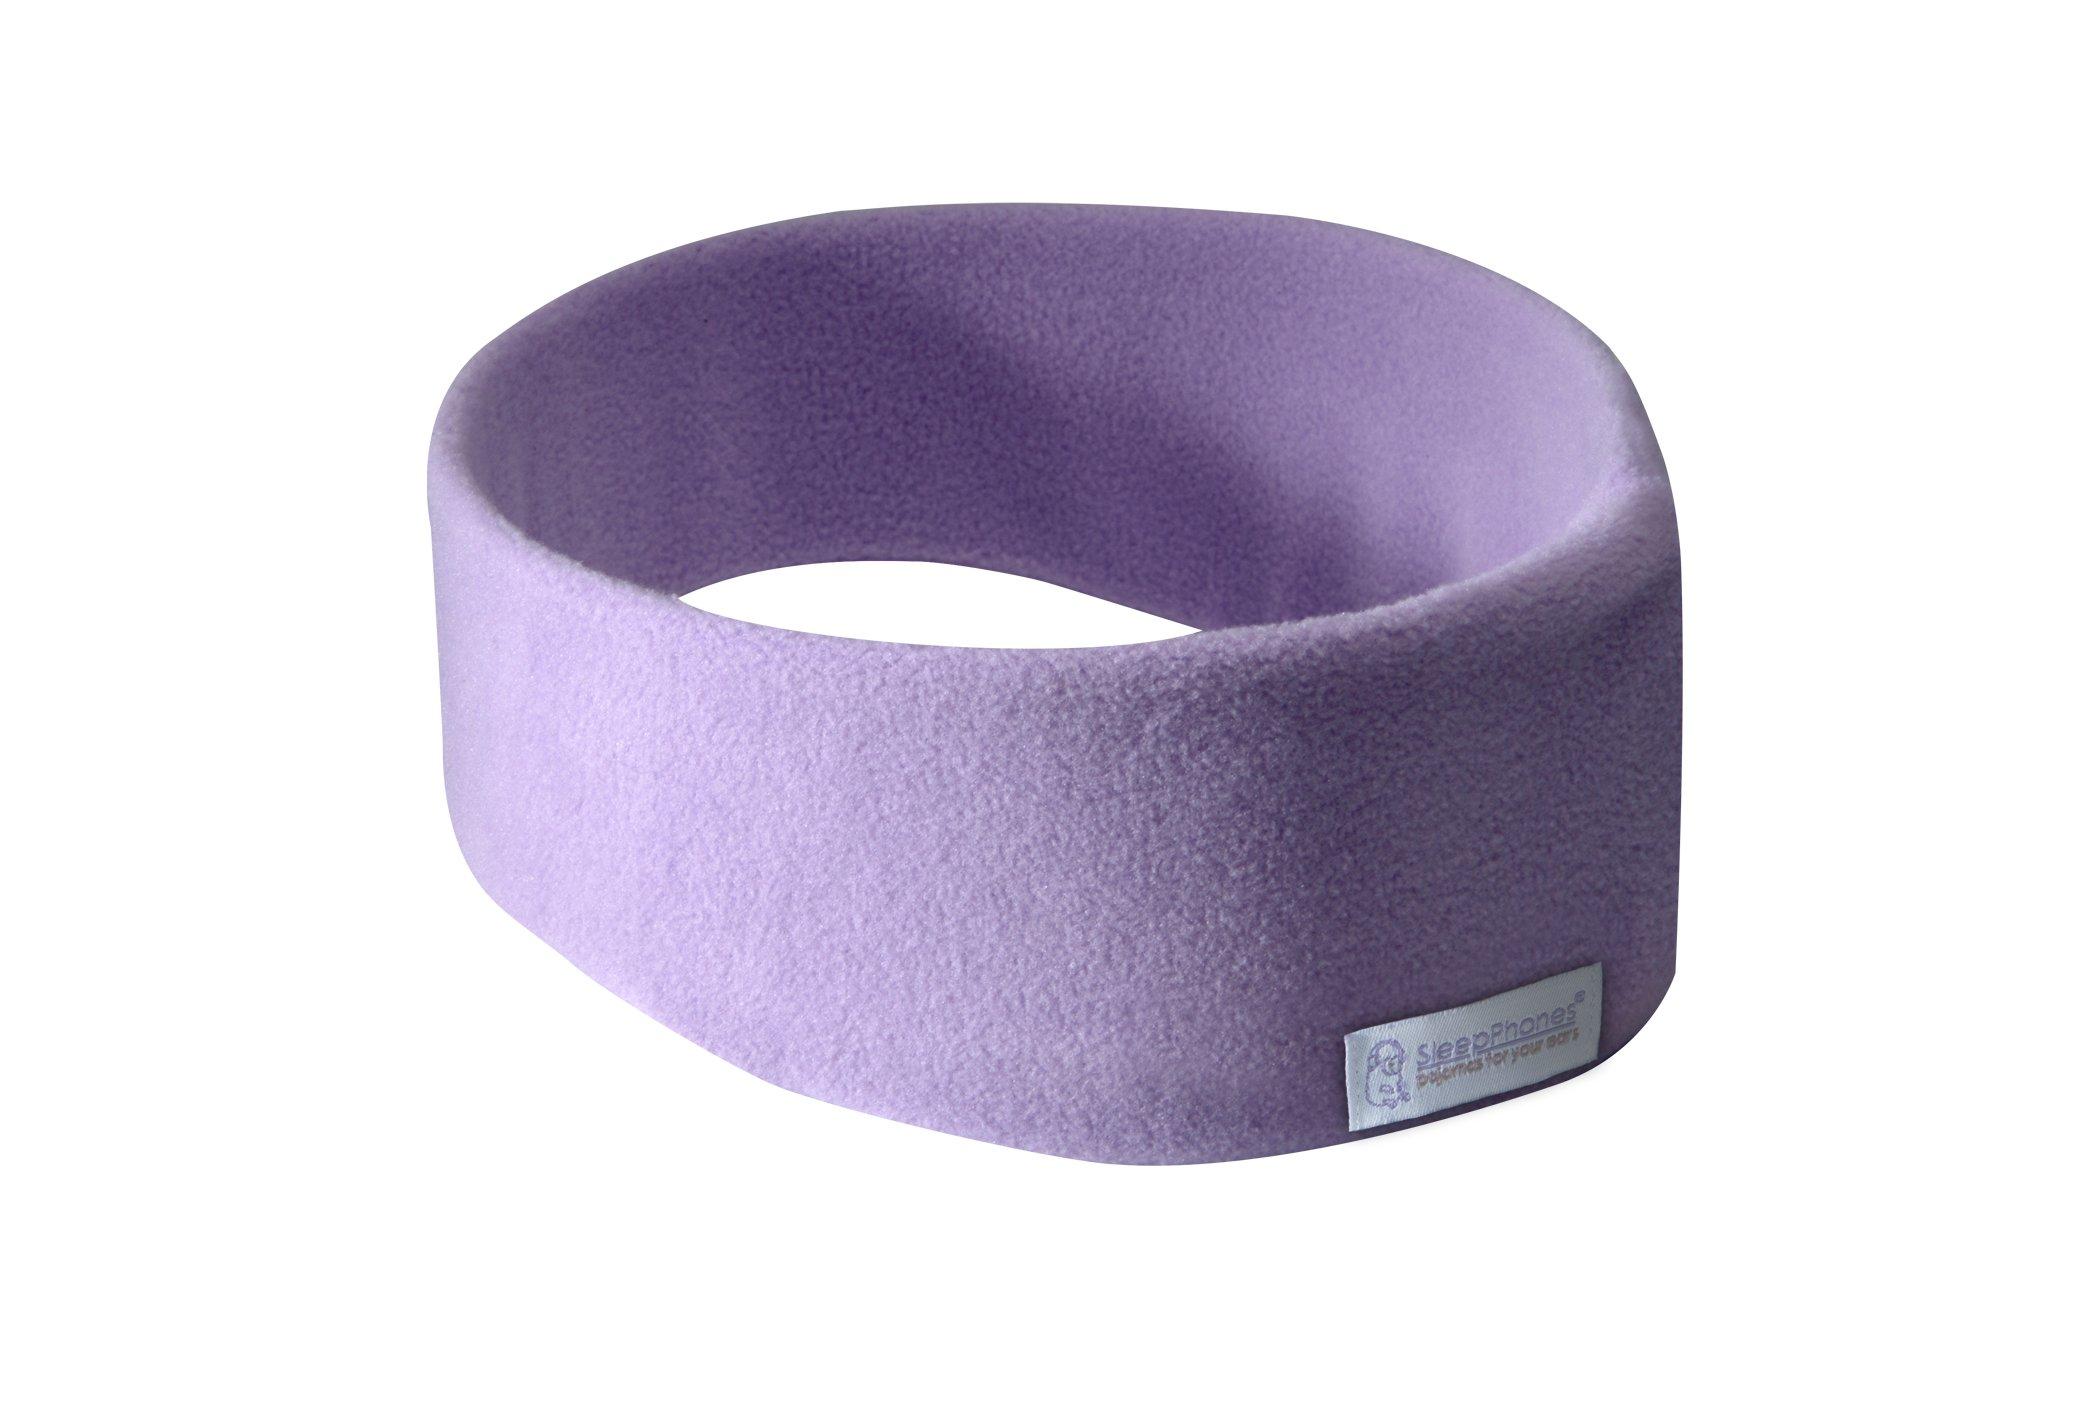 AcousticSheep SleepPhones Wireless | Bluetooth Headphones for Sleep, Travel & More | Flat Speakers | Rechargeable Battery Lasts Up to 10 Hours | Quiet Lavender - Fleece Fabric (Size L)